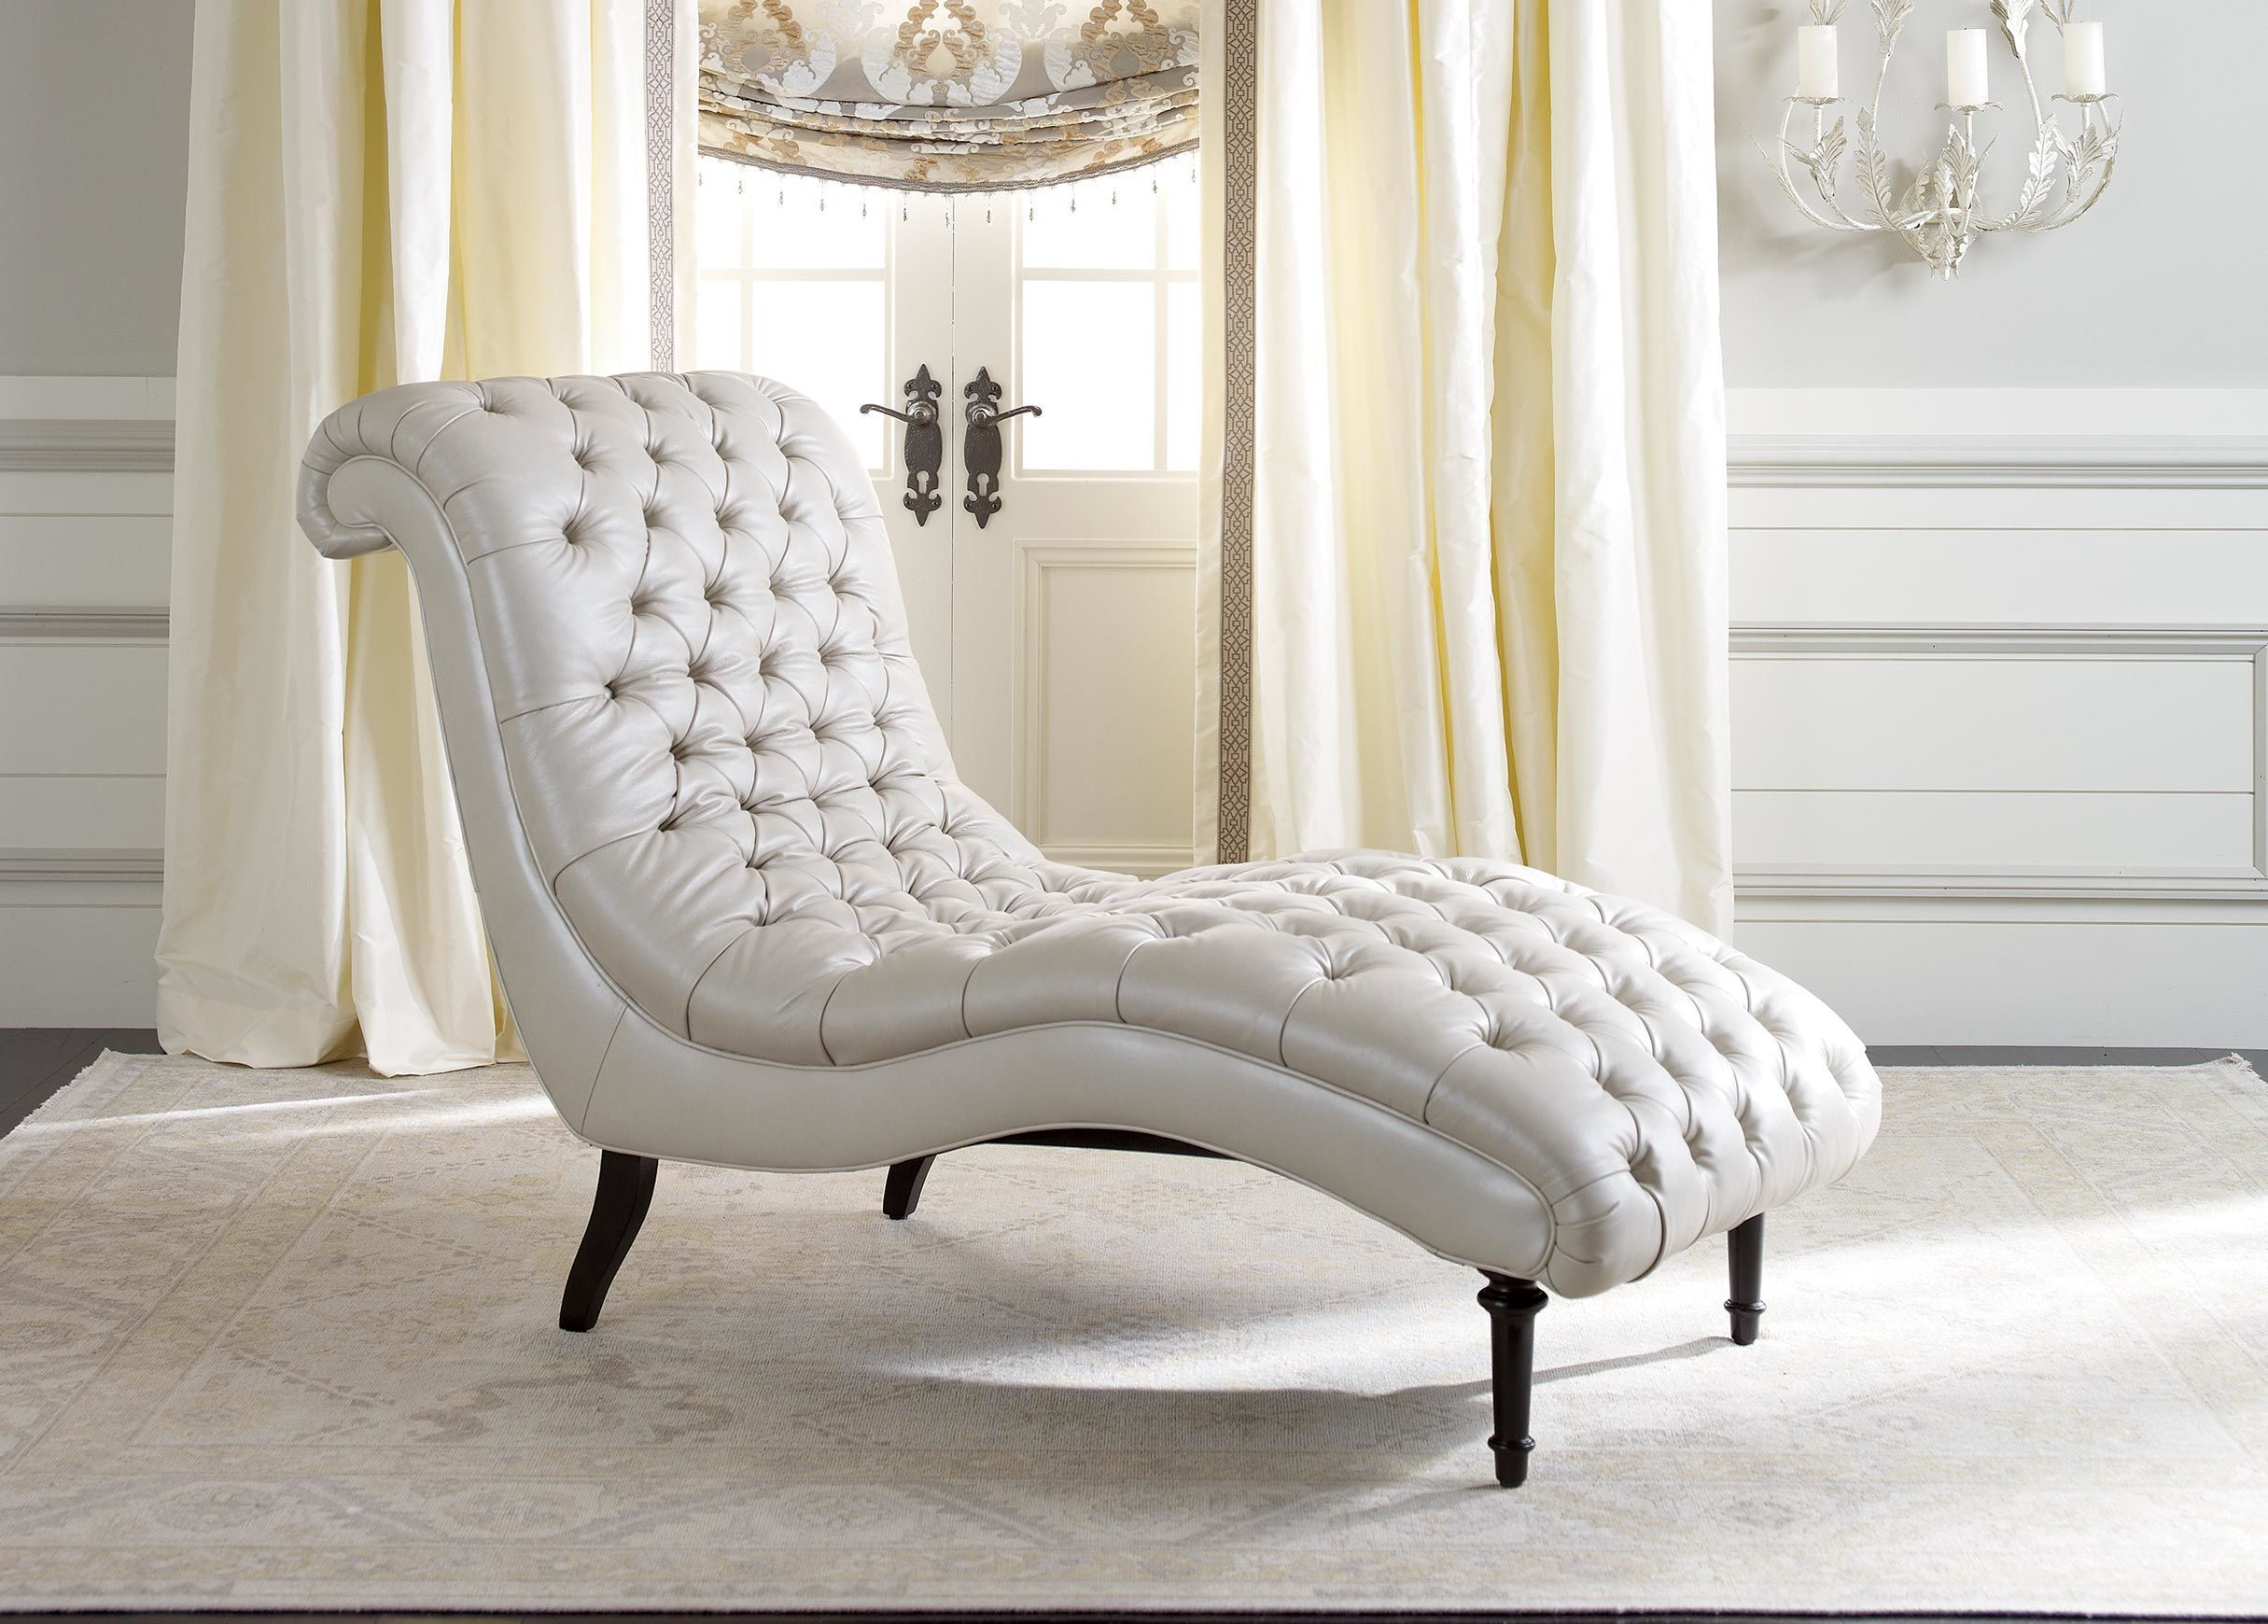 Harlowe Leather Chaise - Ethan Allen   Teak   Pinterest   Chaise ...